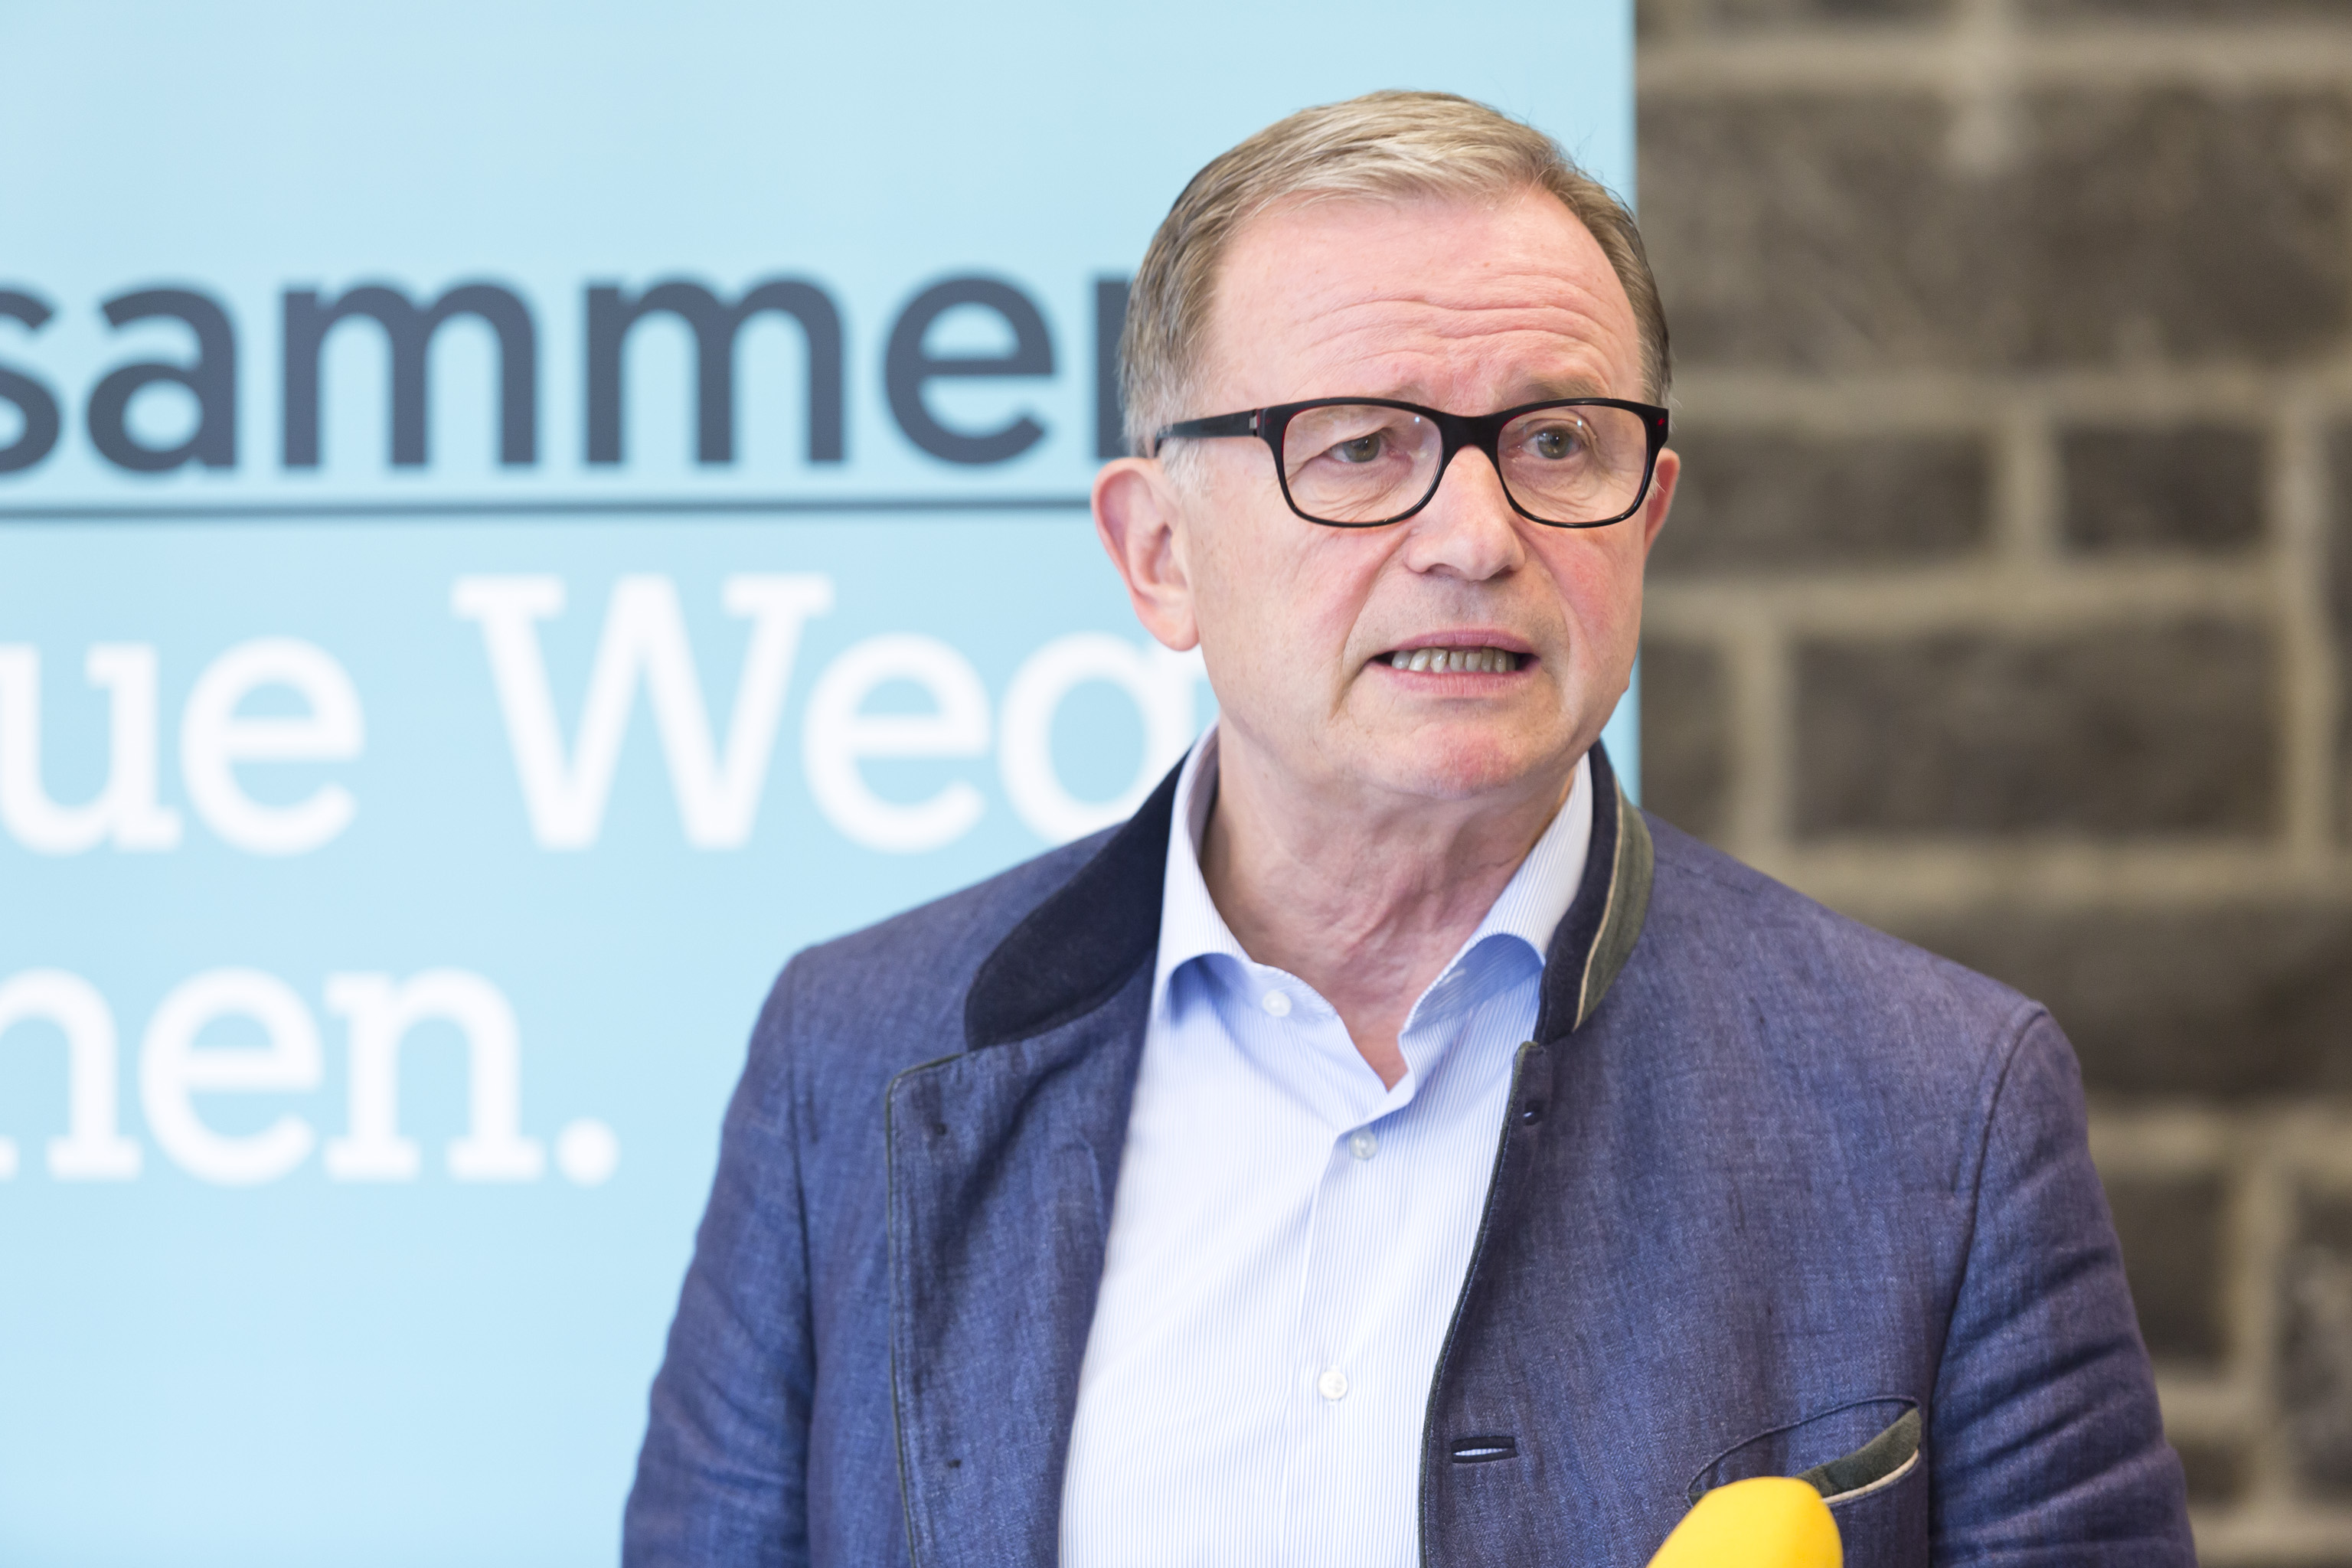 Feldkirch am 8.9.2017 PK Pressekonferenz Karlheinz Kopf und LH Markus Wallner im Roessle Feldkirch